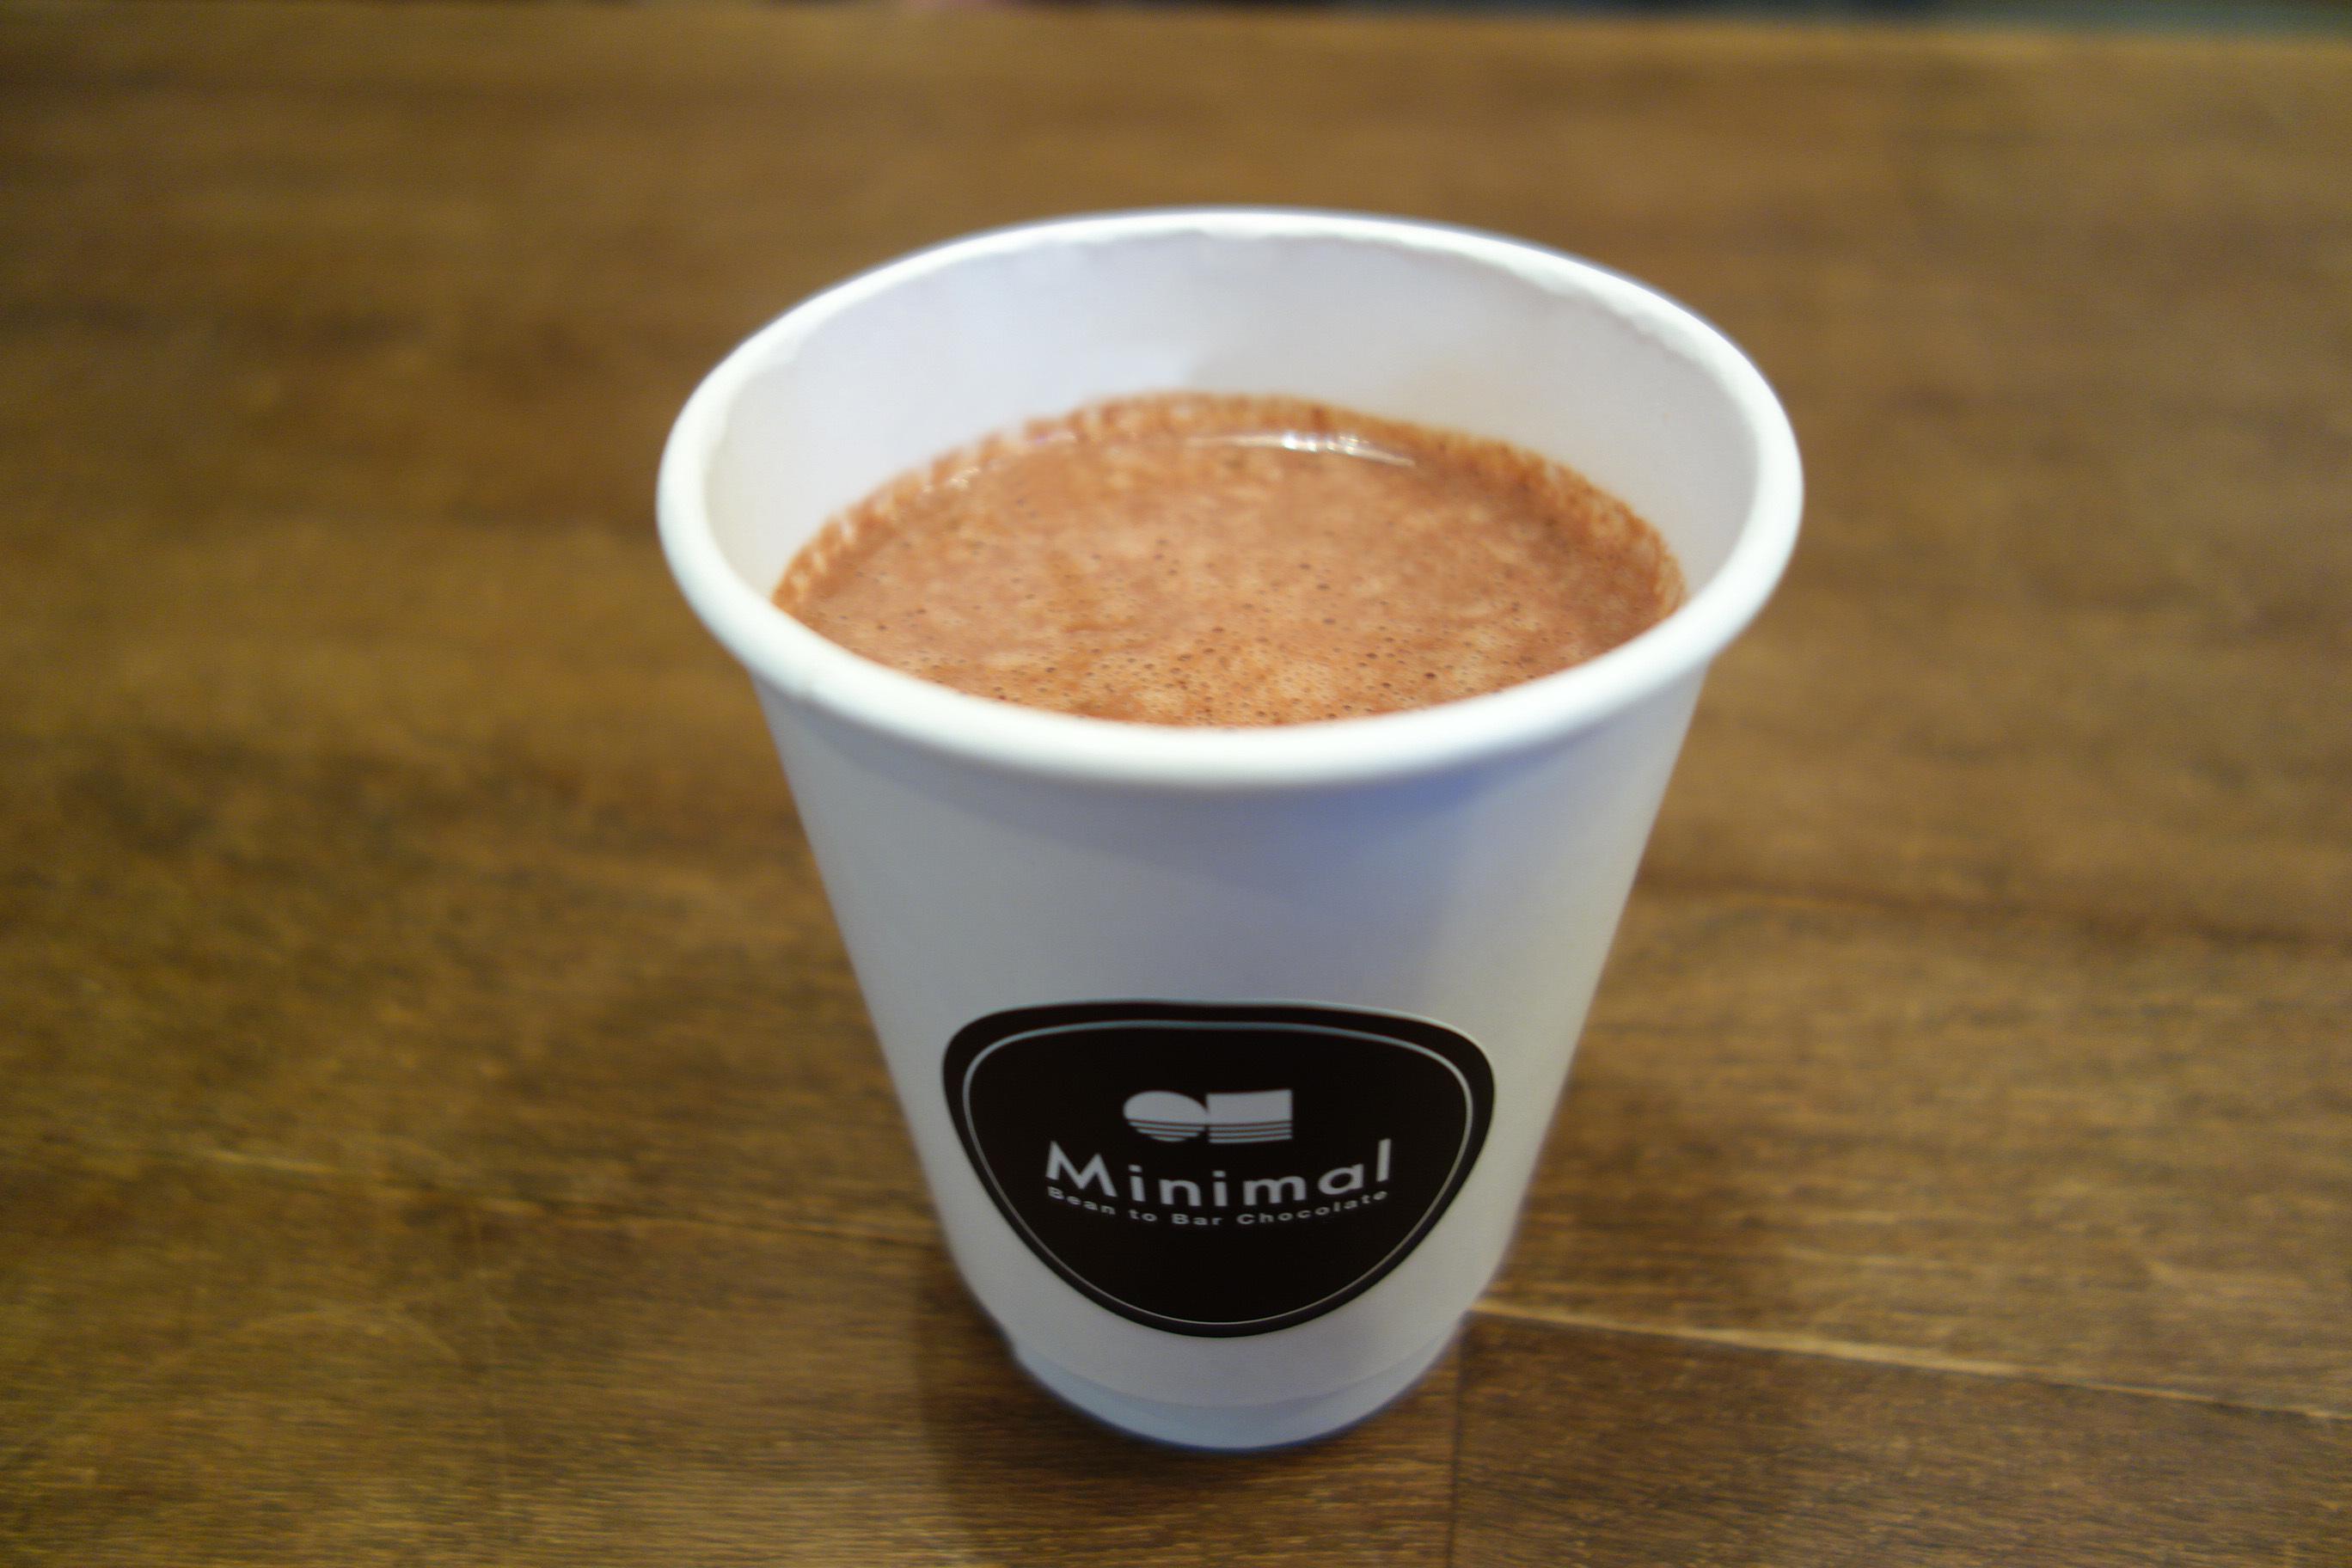 Minimal - Bean to Bar Chocolate -『ホットチョコレート』